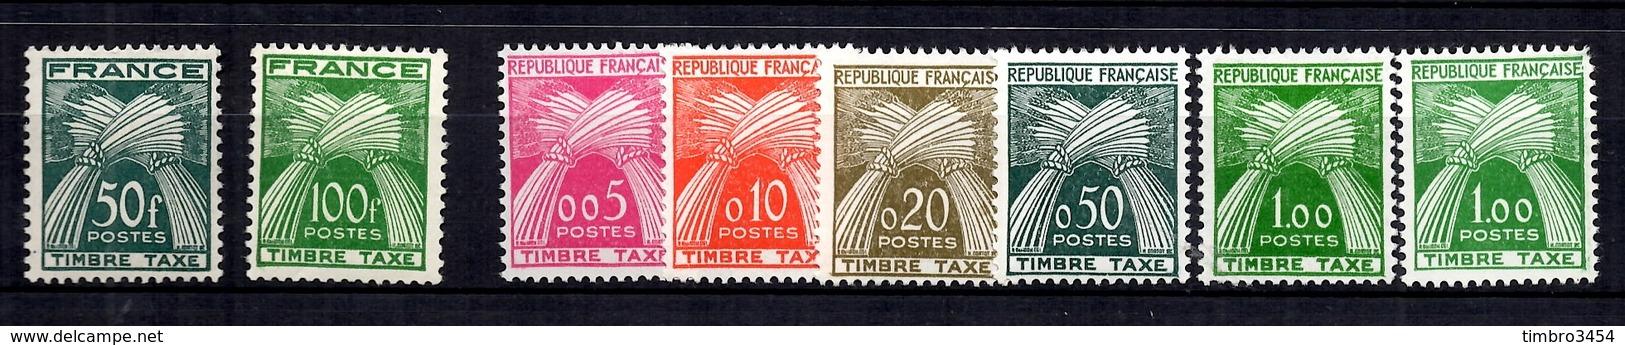 France Timbres Taxe YT N° 88/89 Et 90/94 Neufs ** MNH. TB. A Saisir! - Taxes